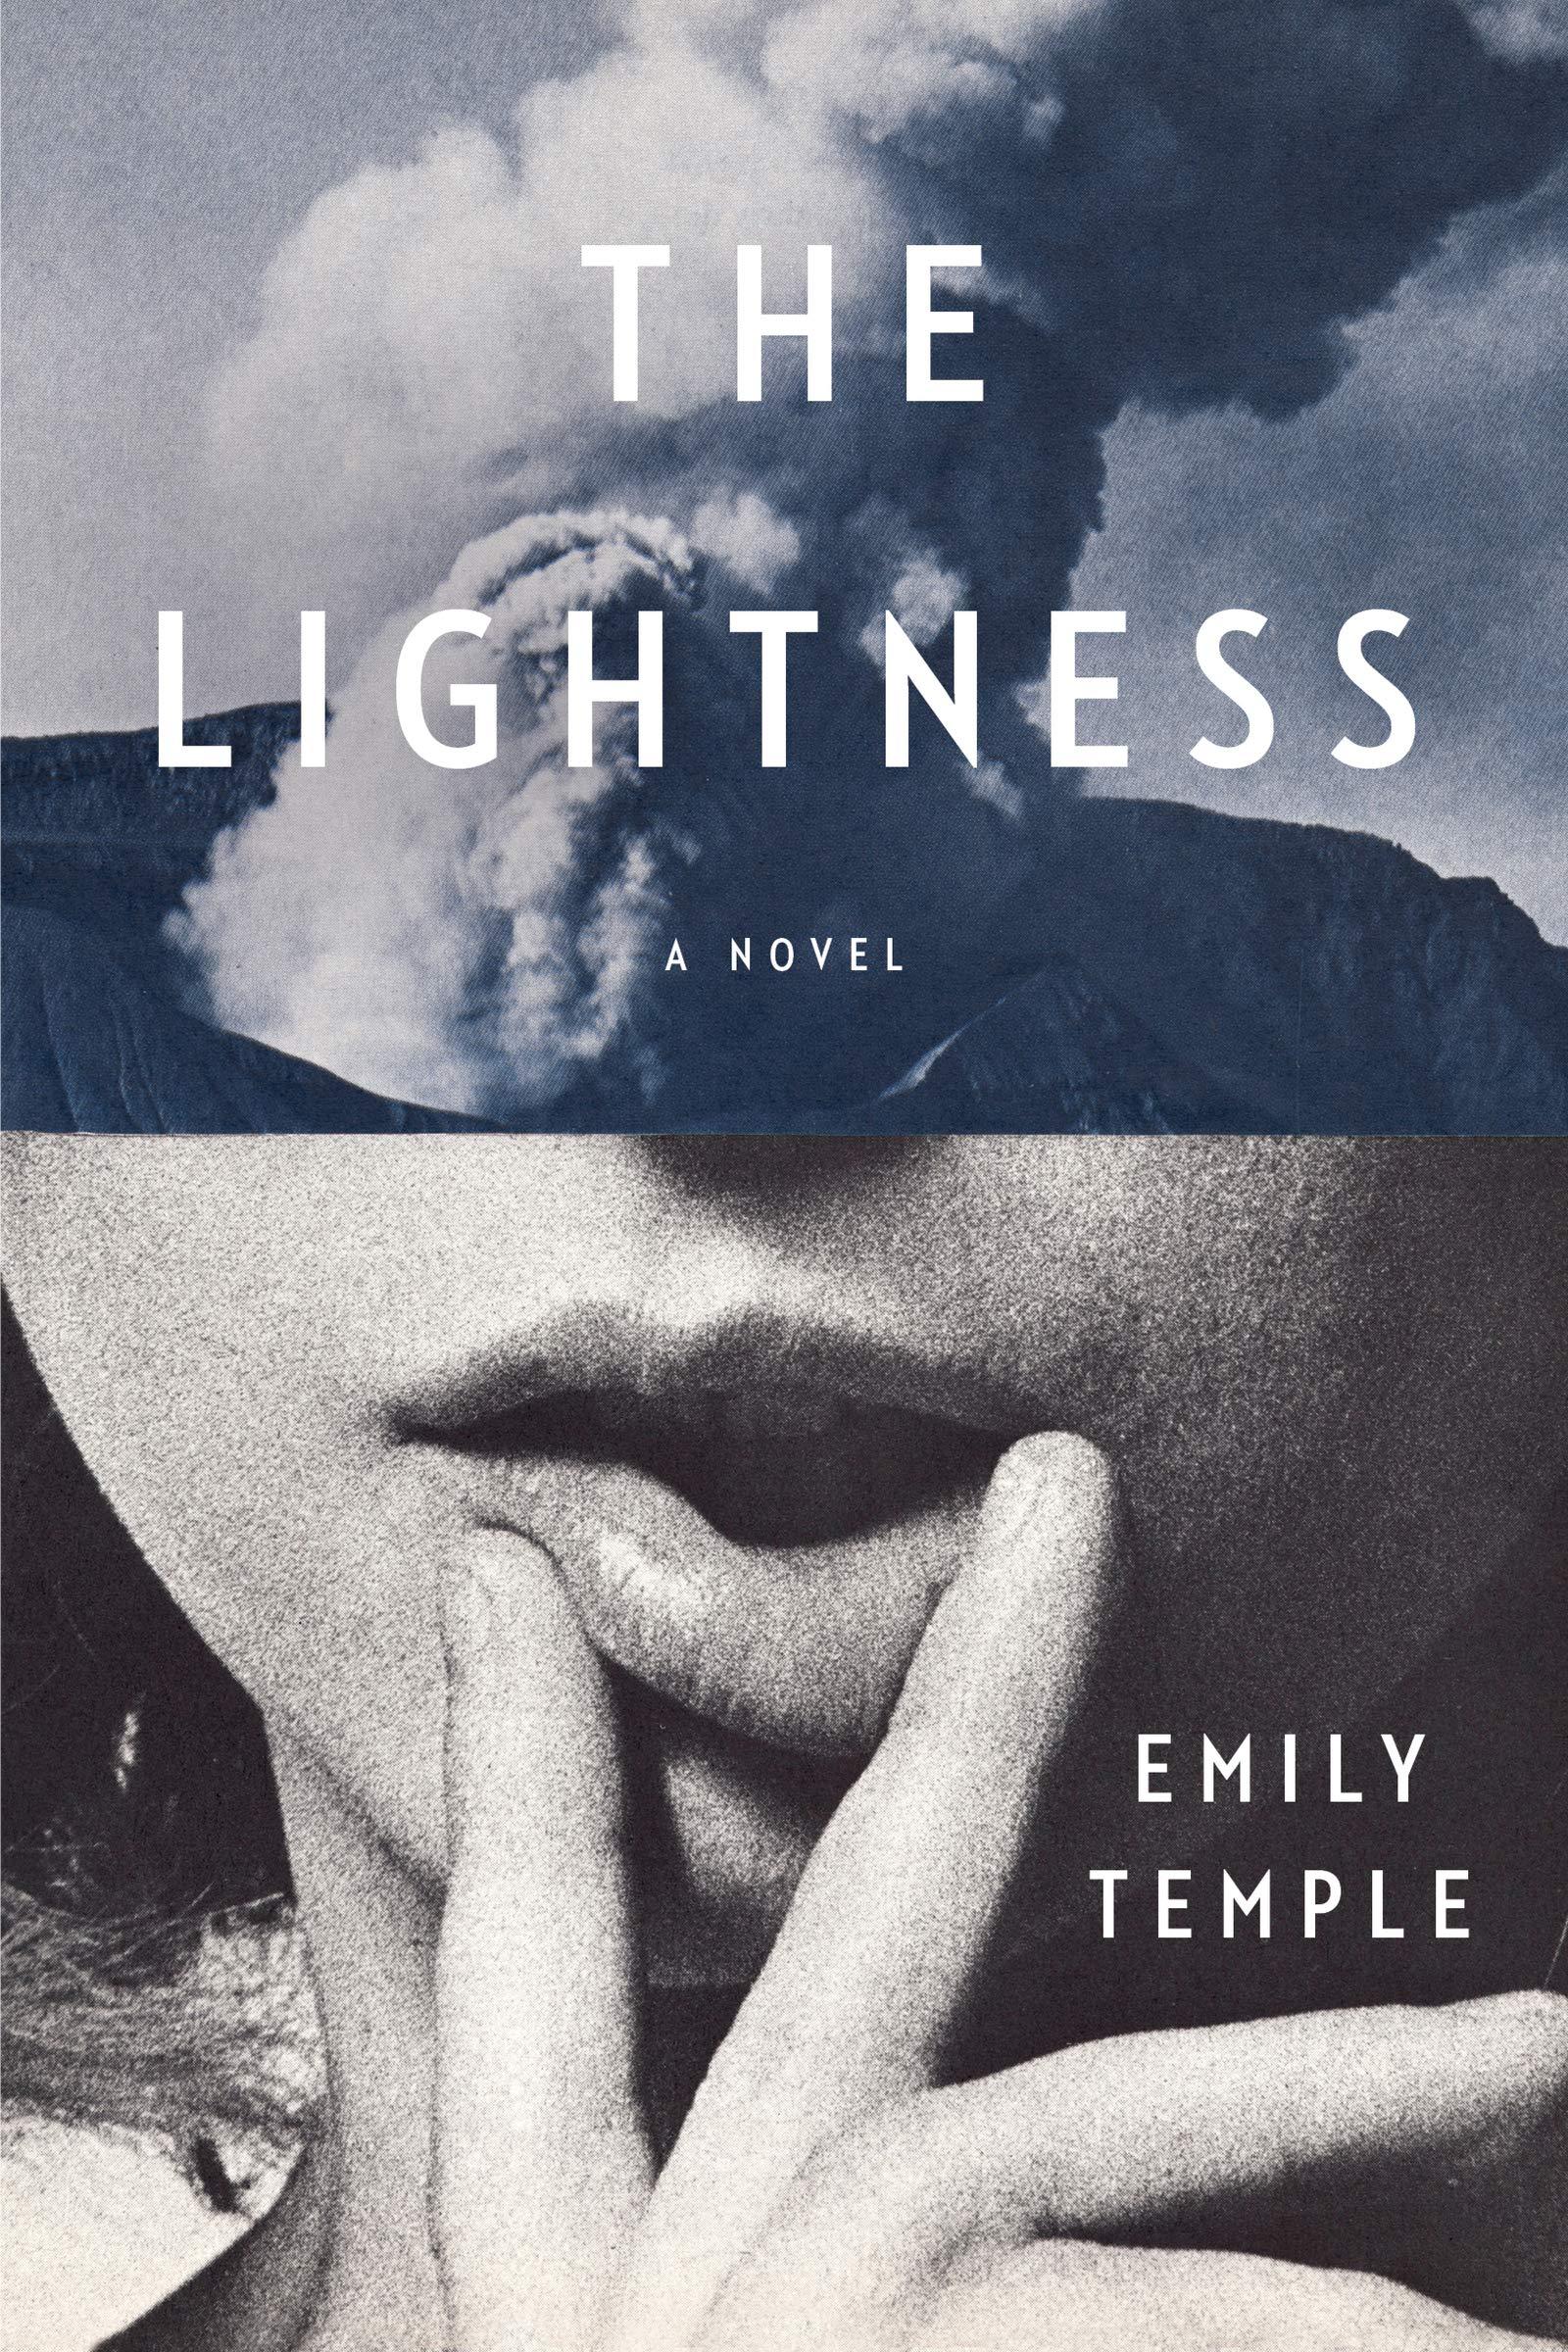 Amazon.com: The Lightness: A Novel (9780062905321): Emily Temple ...